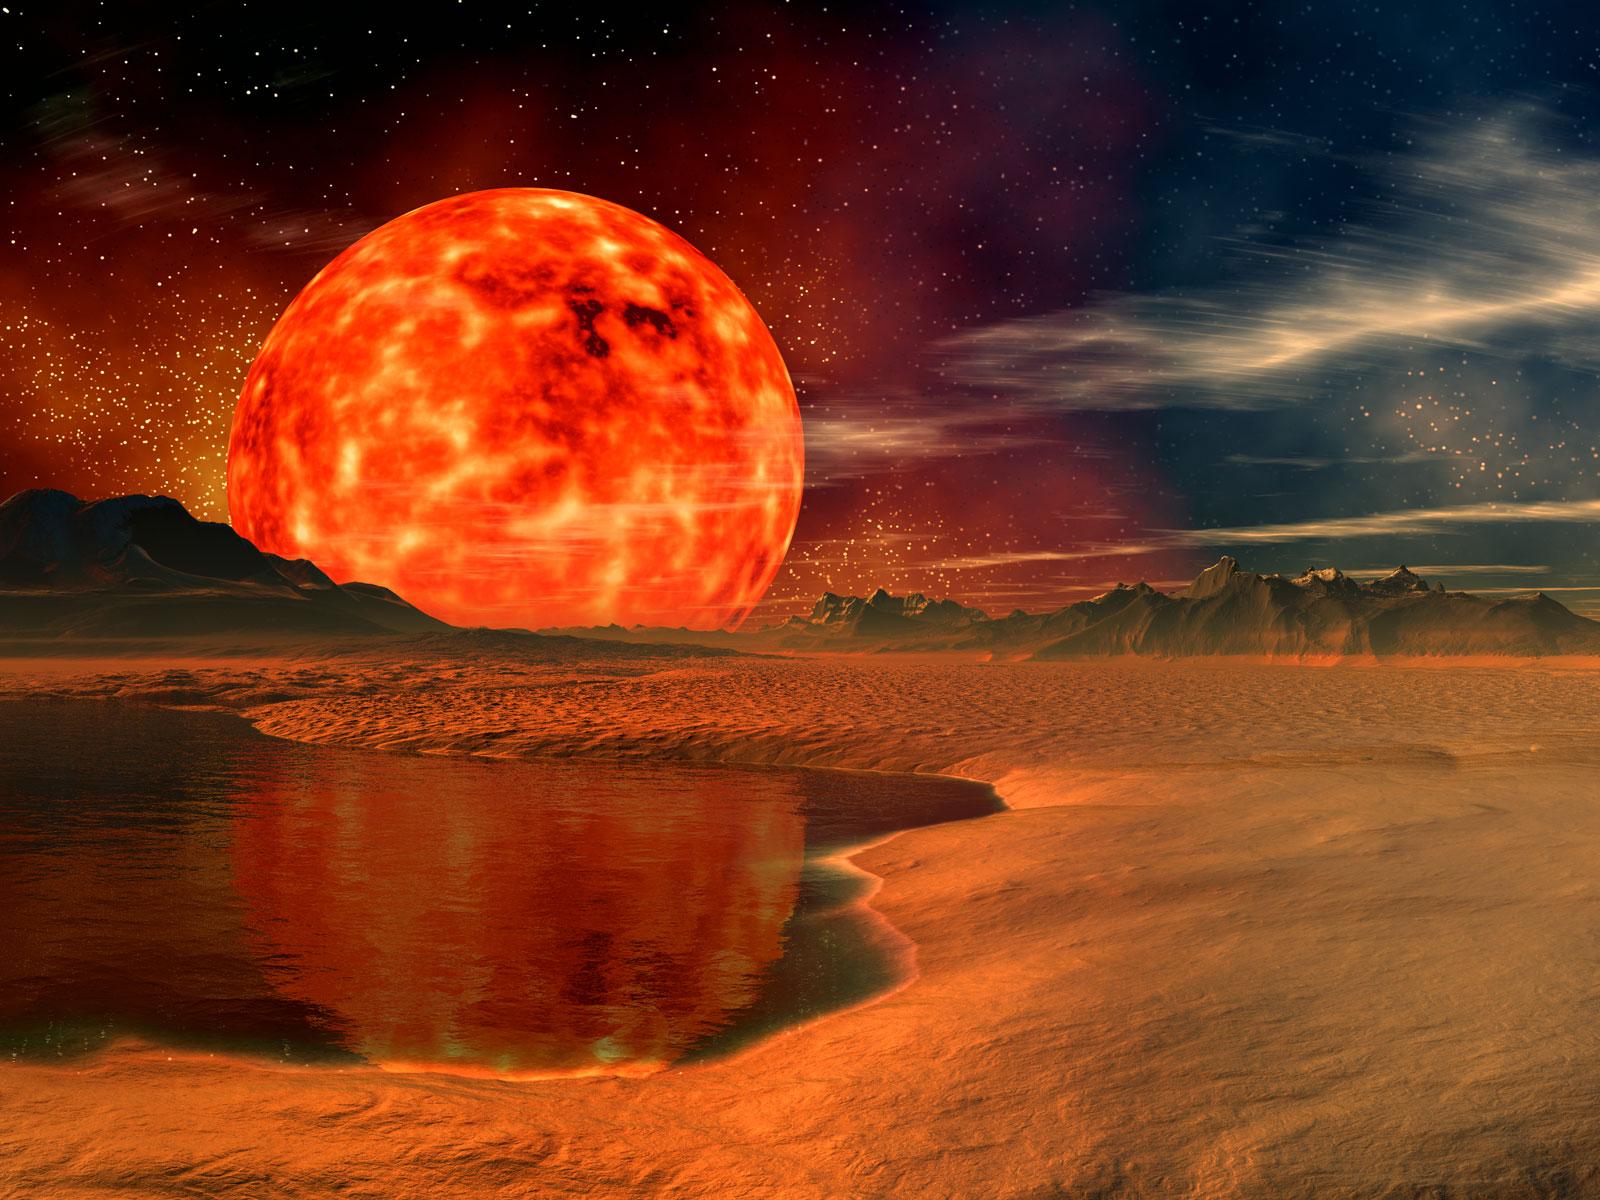 Desktop Backgrounds 4U Planets 1600x1200